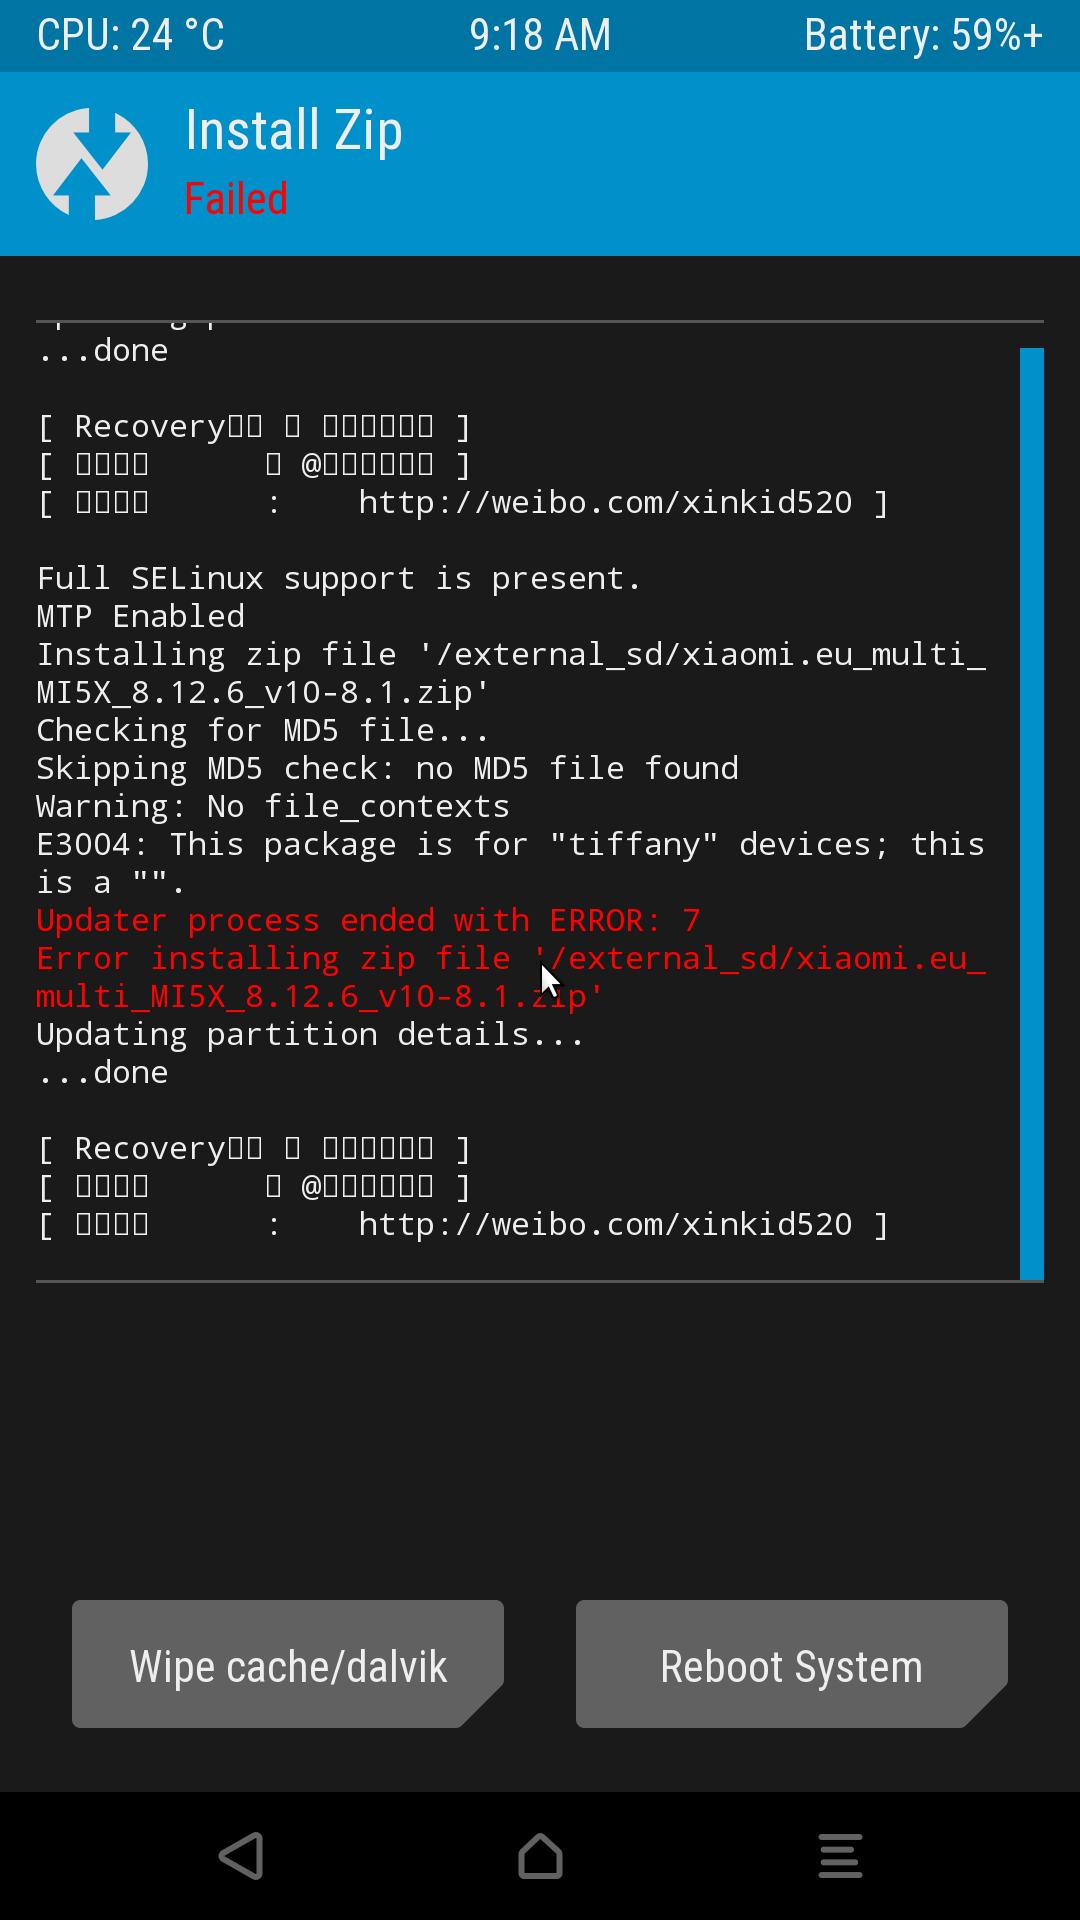 Screenshot_2018-12-07-09-18-24.png